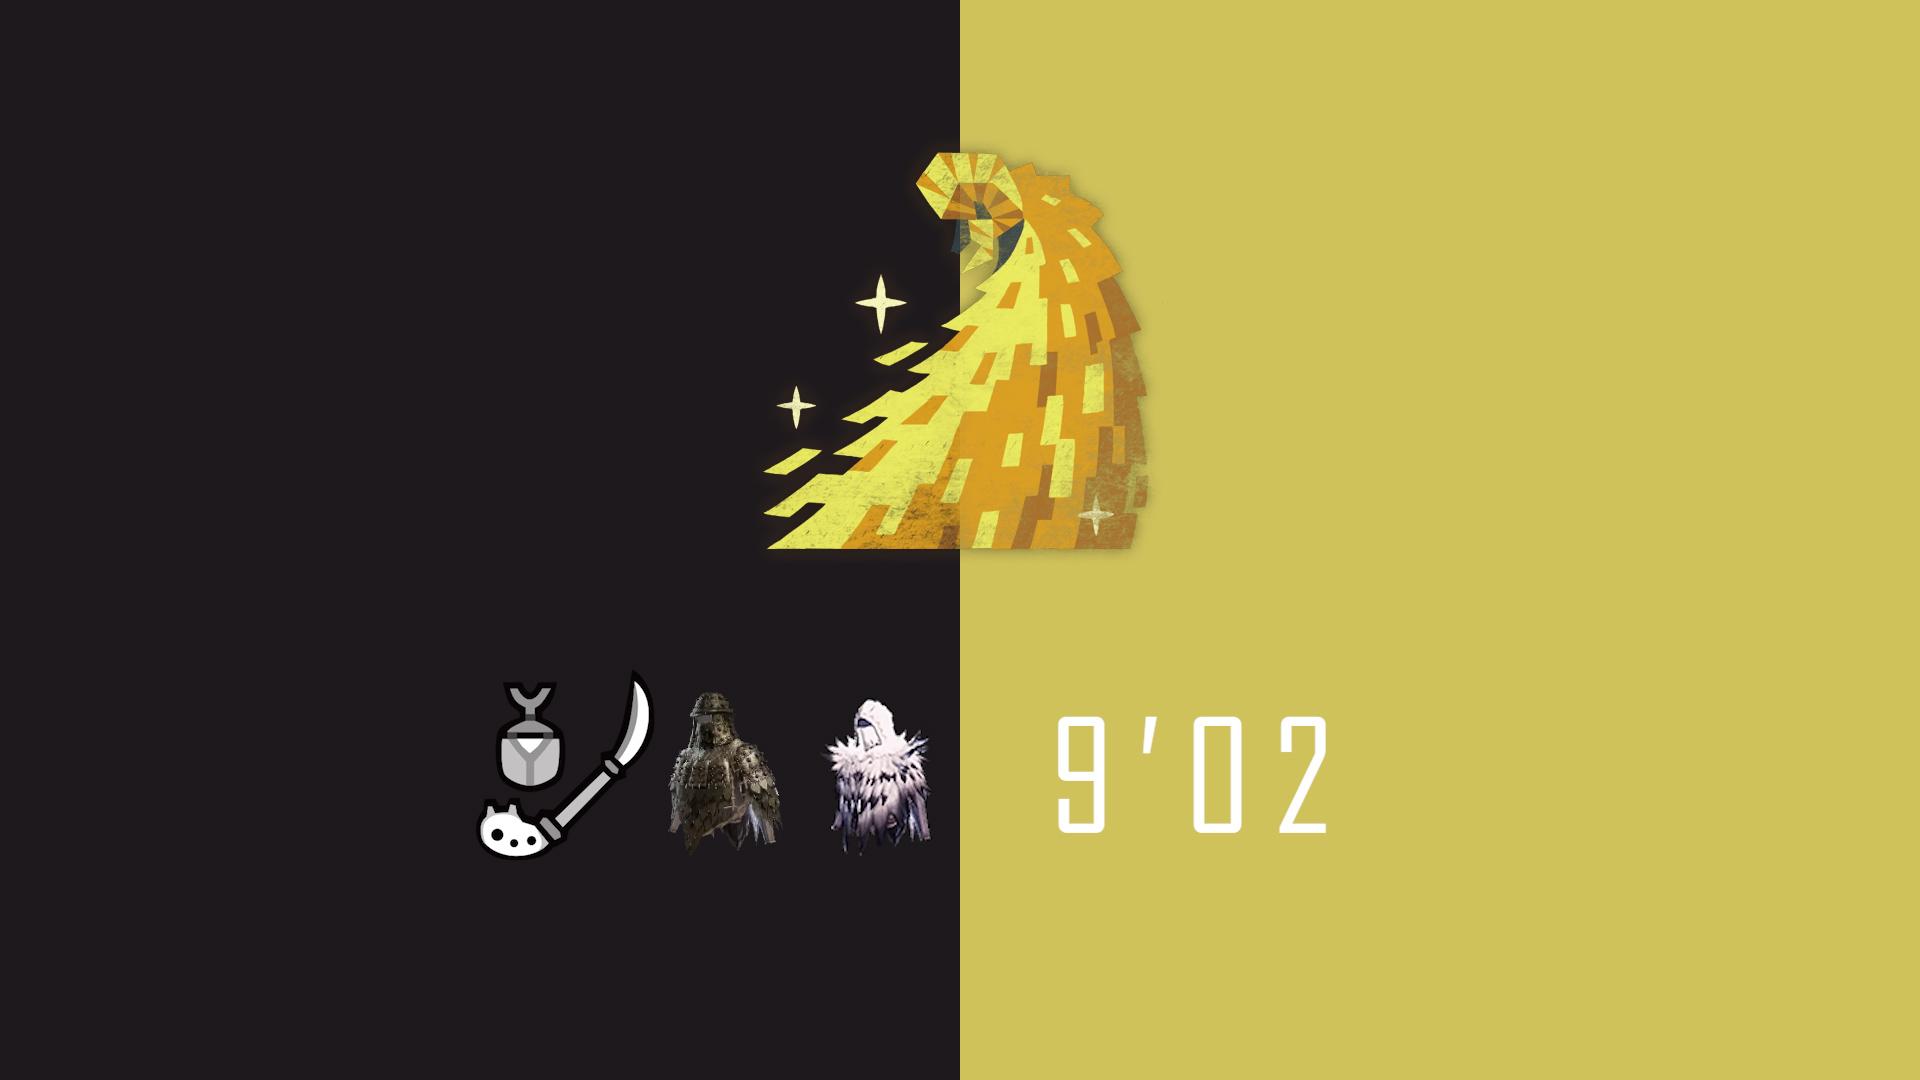 【PC怪物猎人世界冰原】无终止的淘金记 M位绚辉龙 操虫棍 9'02 落石、装衣.ver